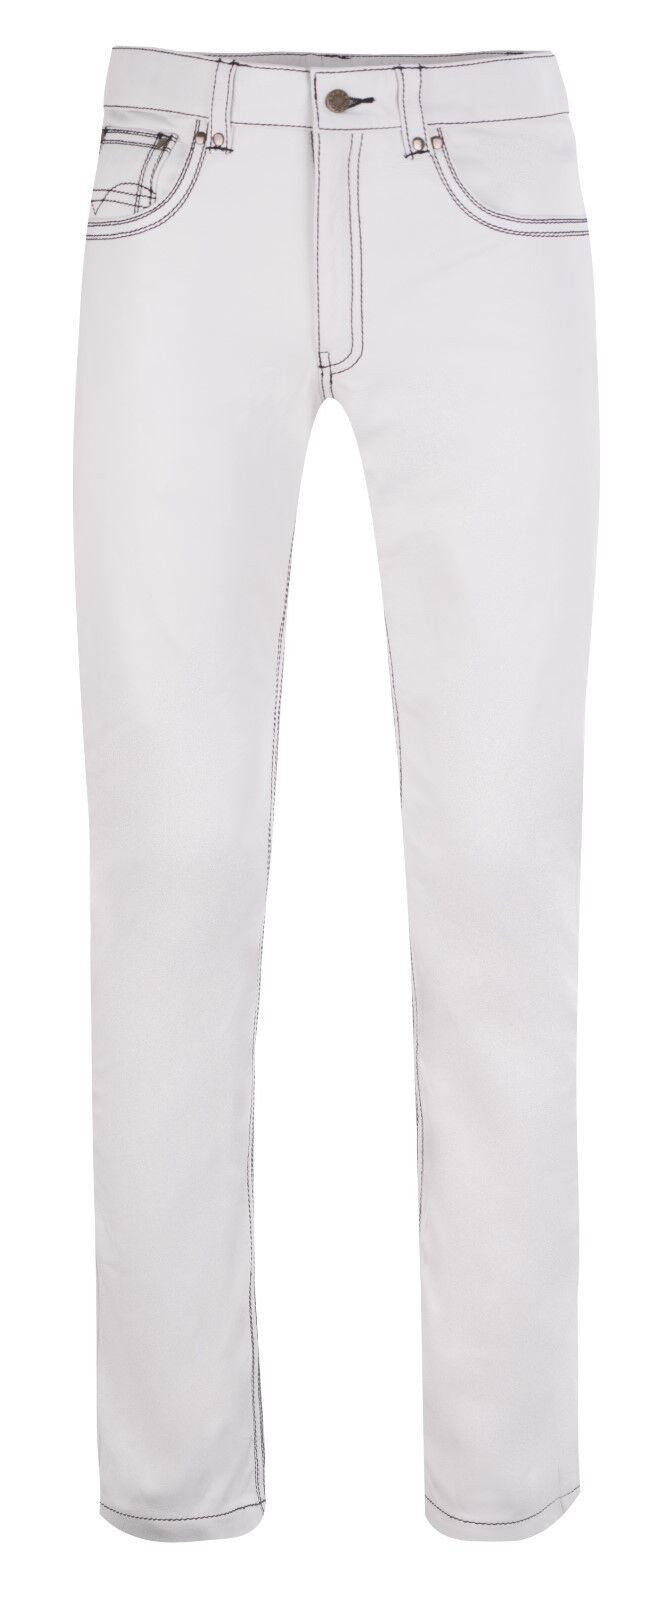 LEDERHOSE weiß Lederjeans schwarze Ziernähte  neu leather trousers pants pants pants Weiß 8688ab